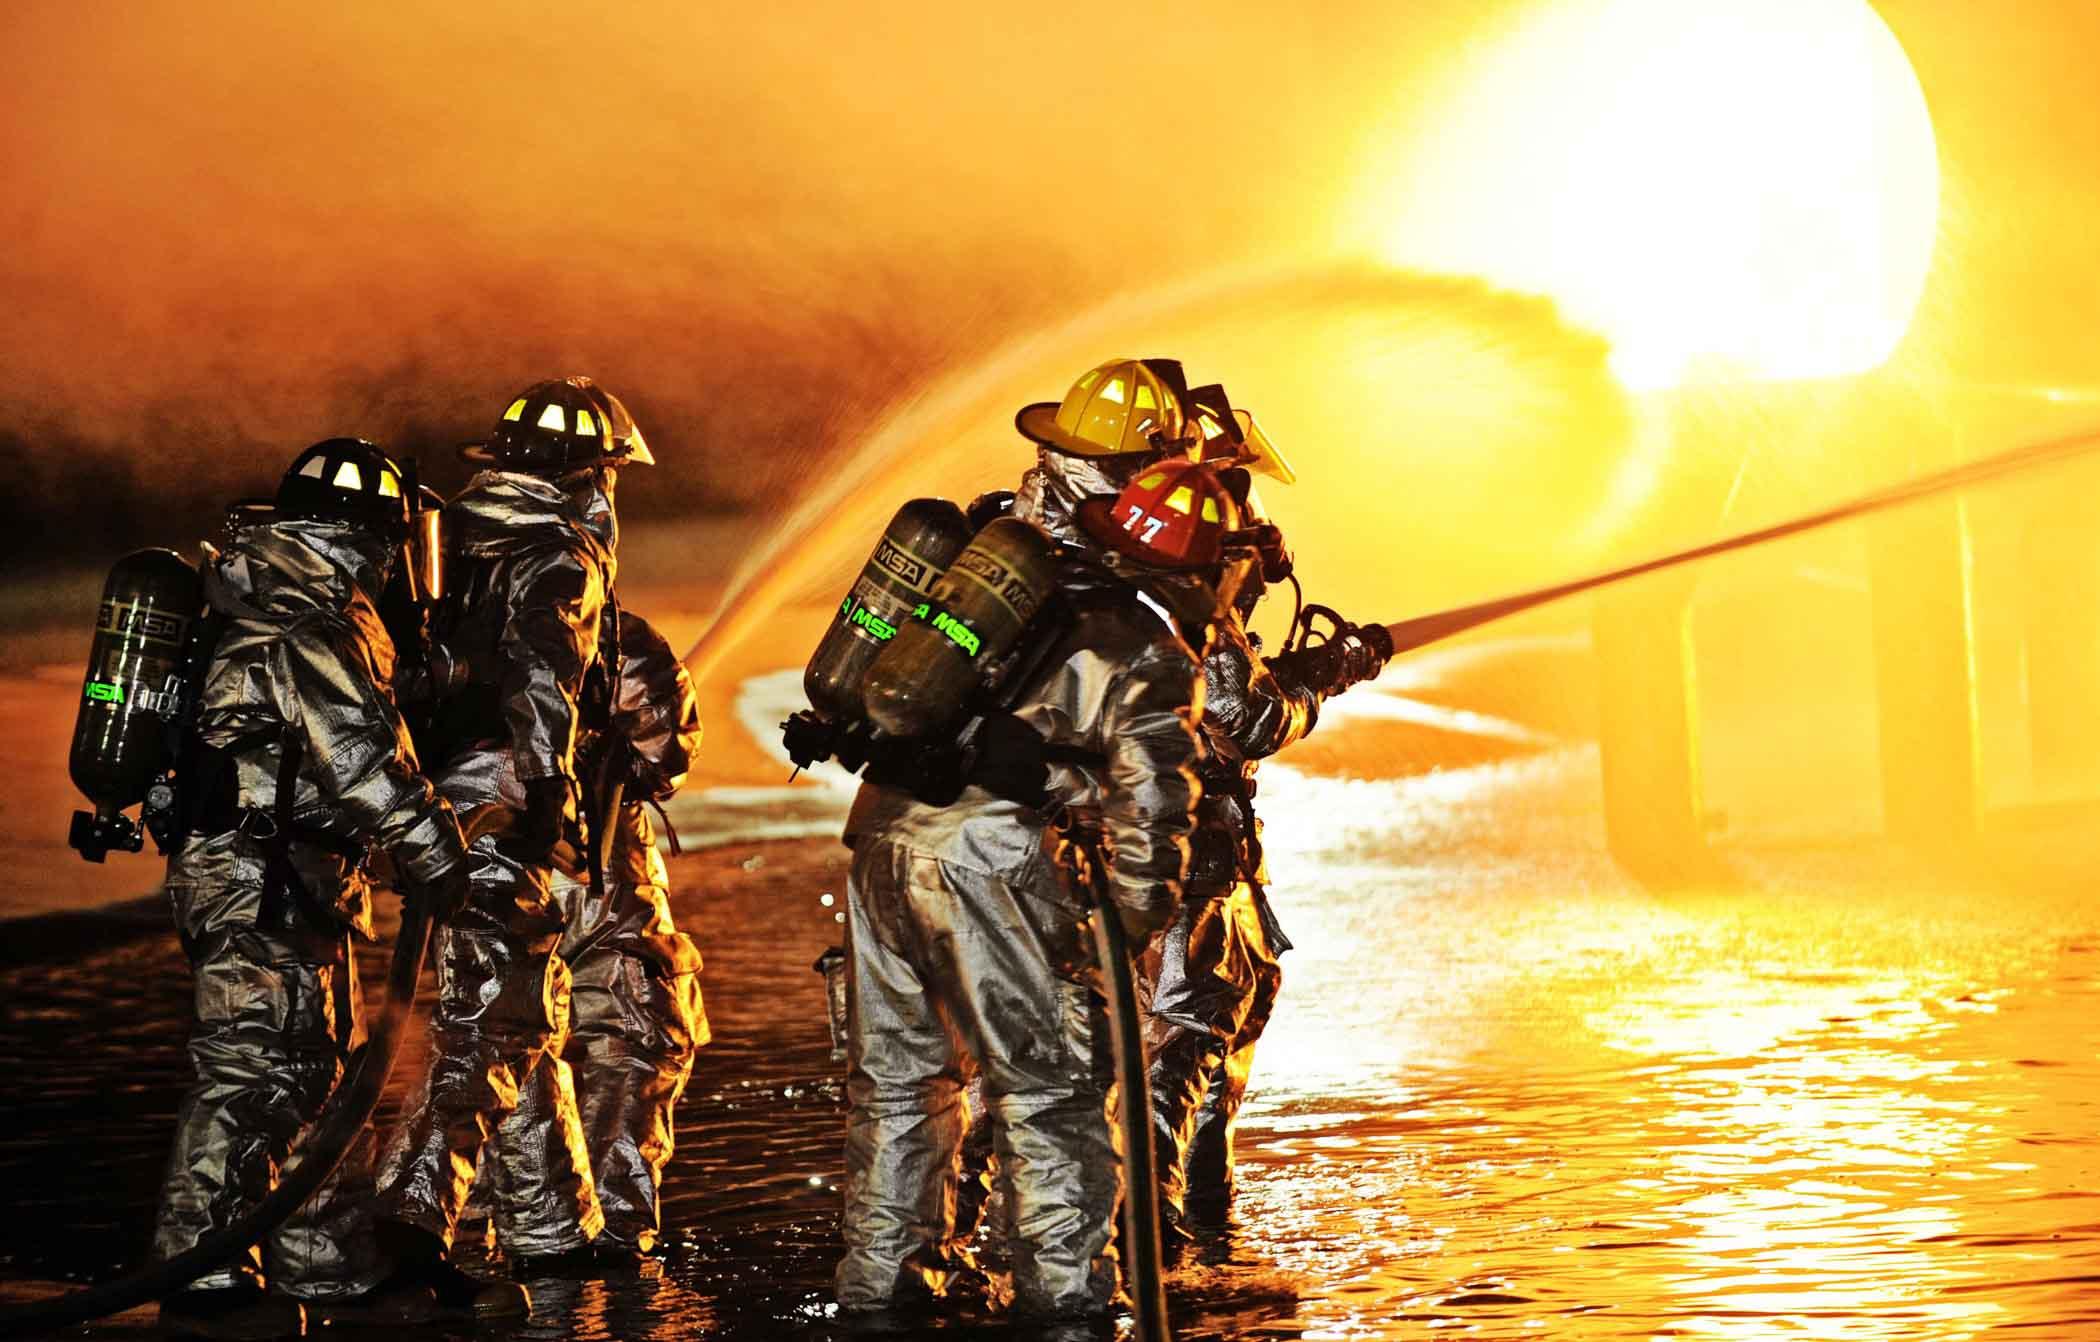 Bomberos apagando incendio